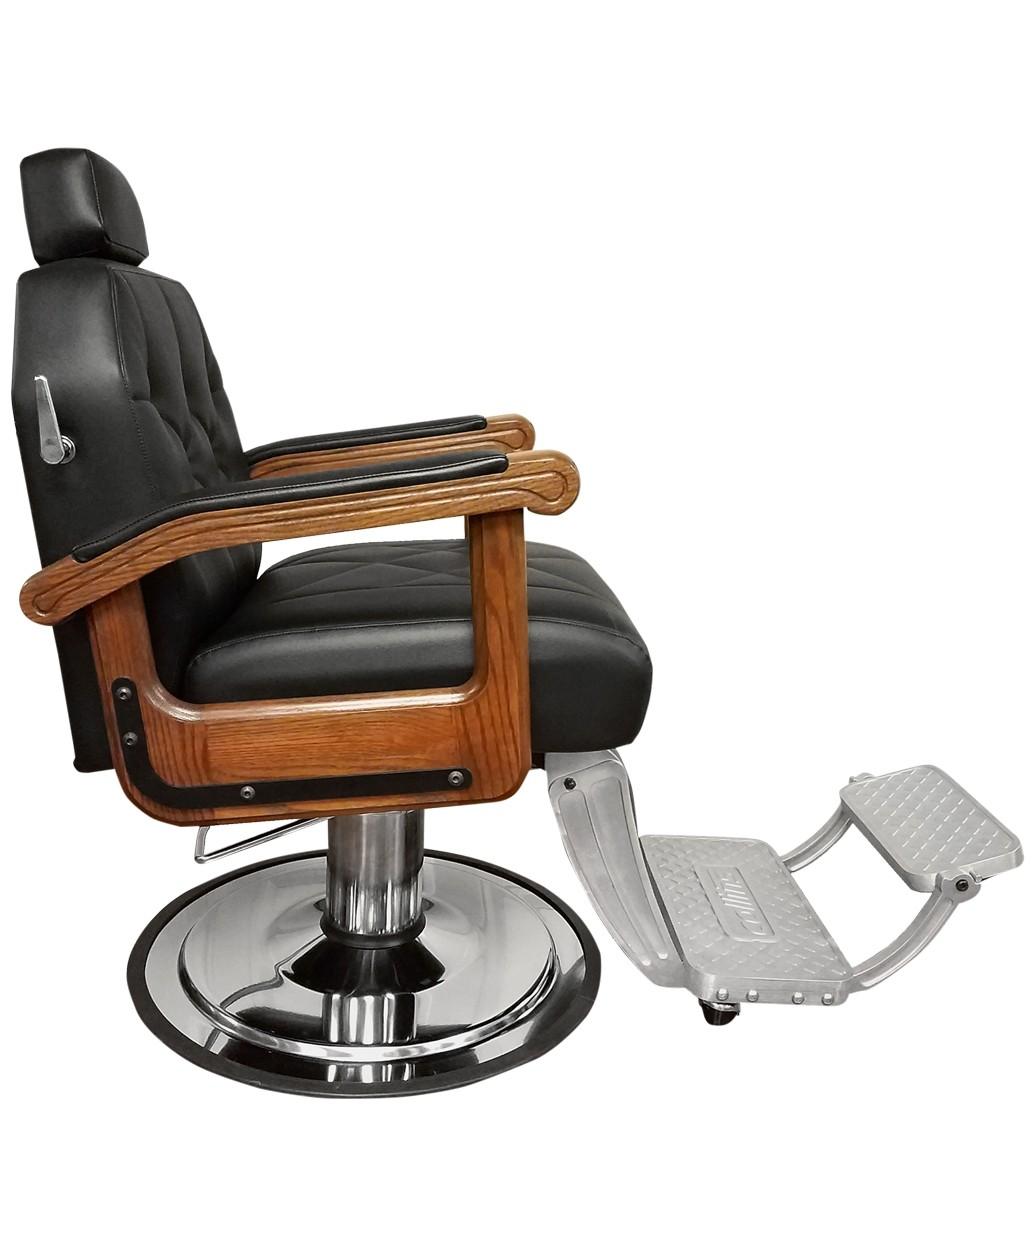 Collins B80 Ambassador Barber Chair